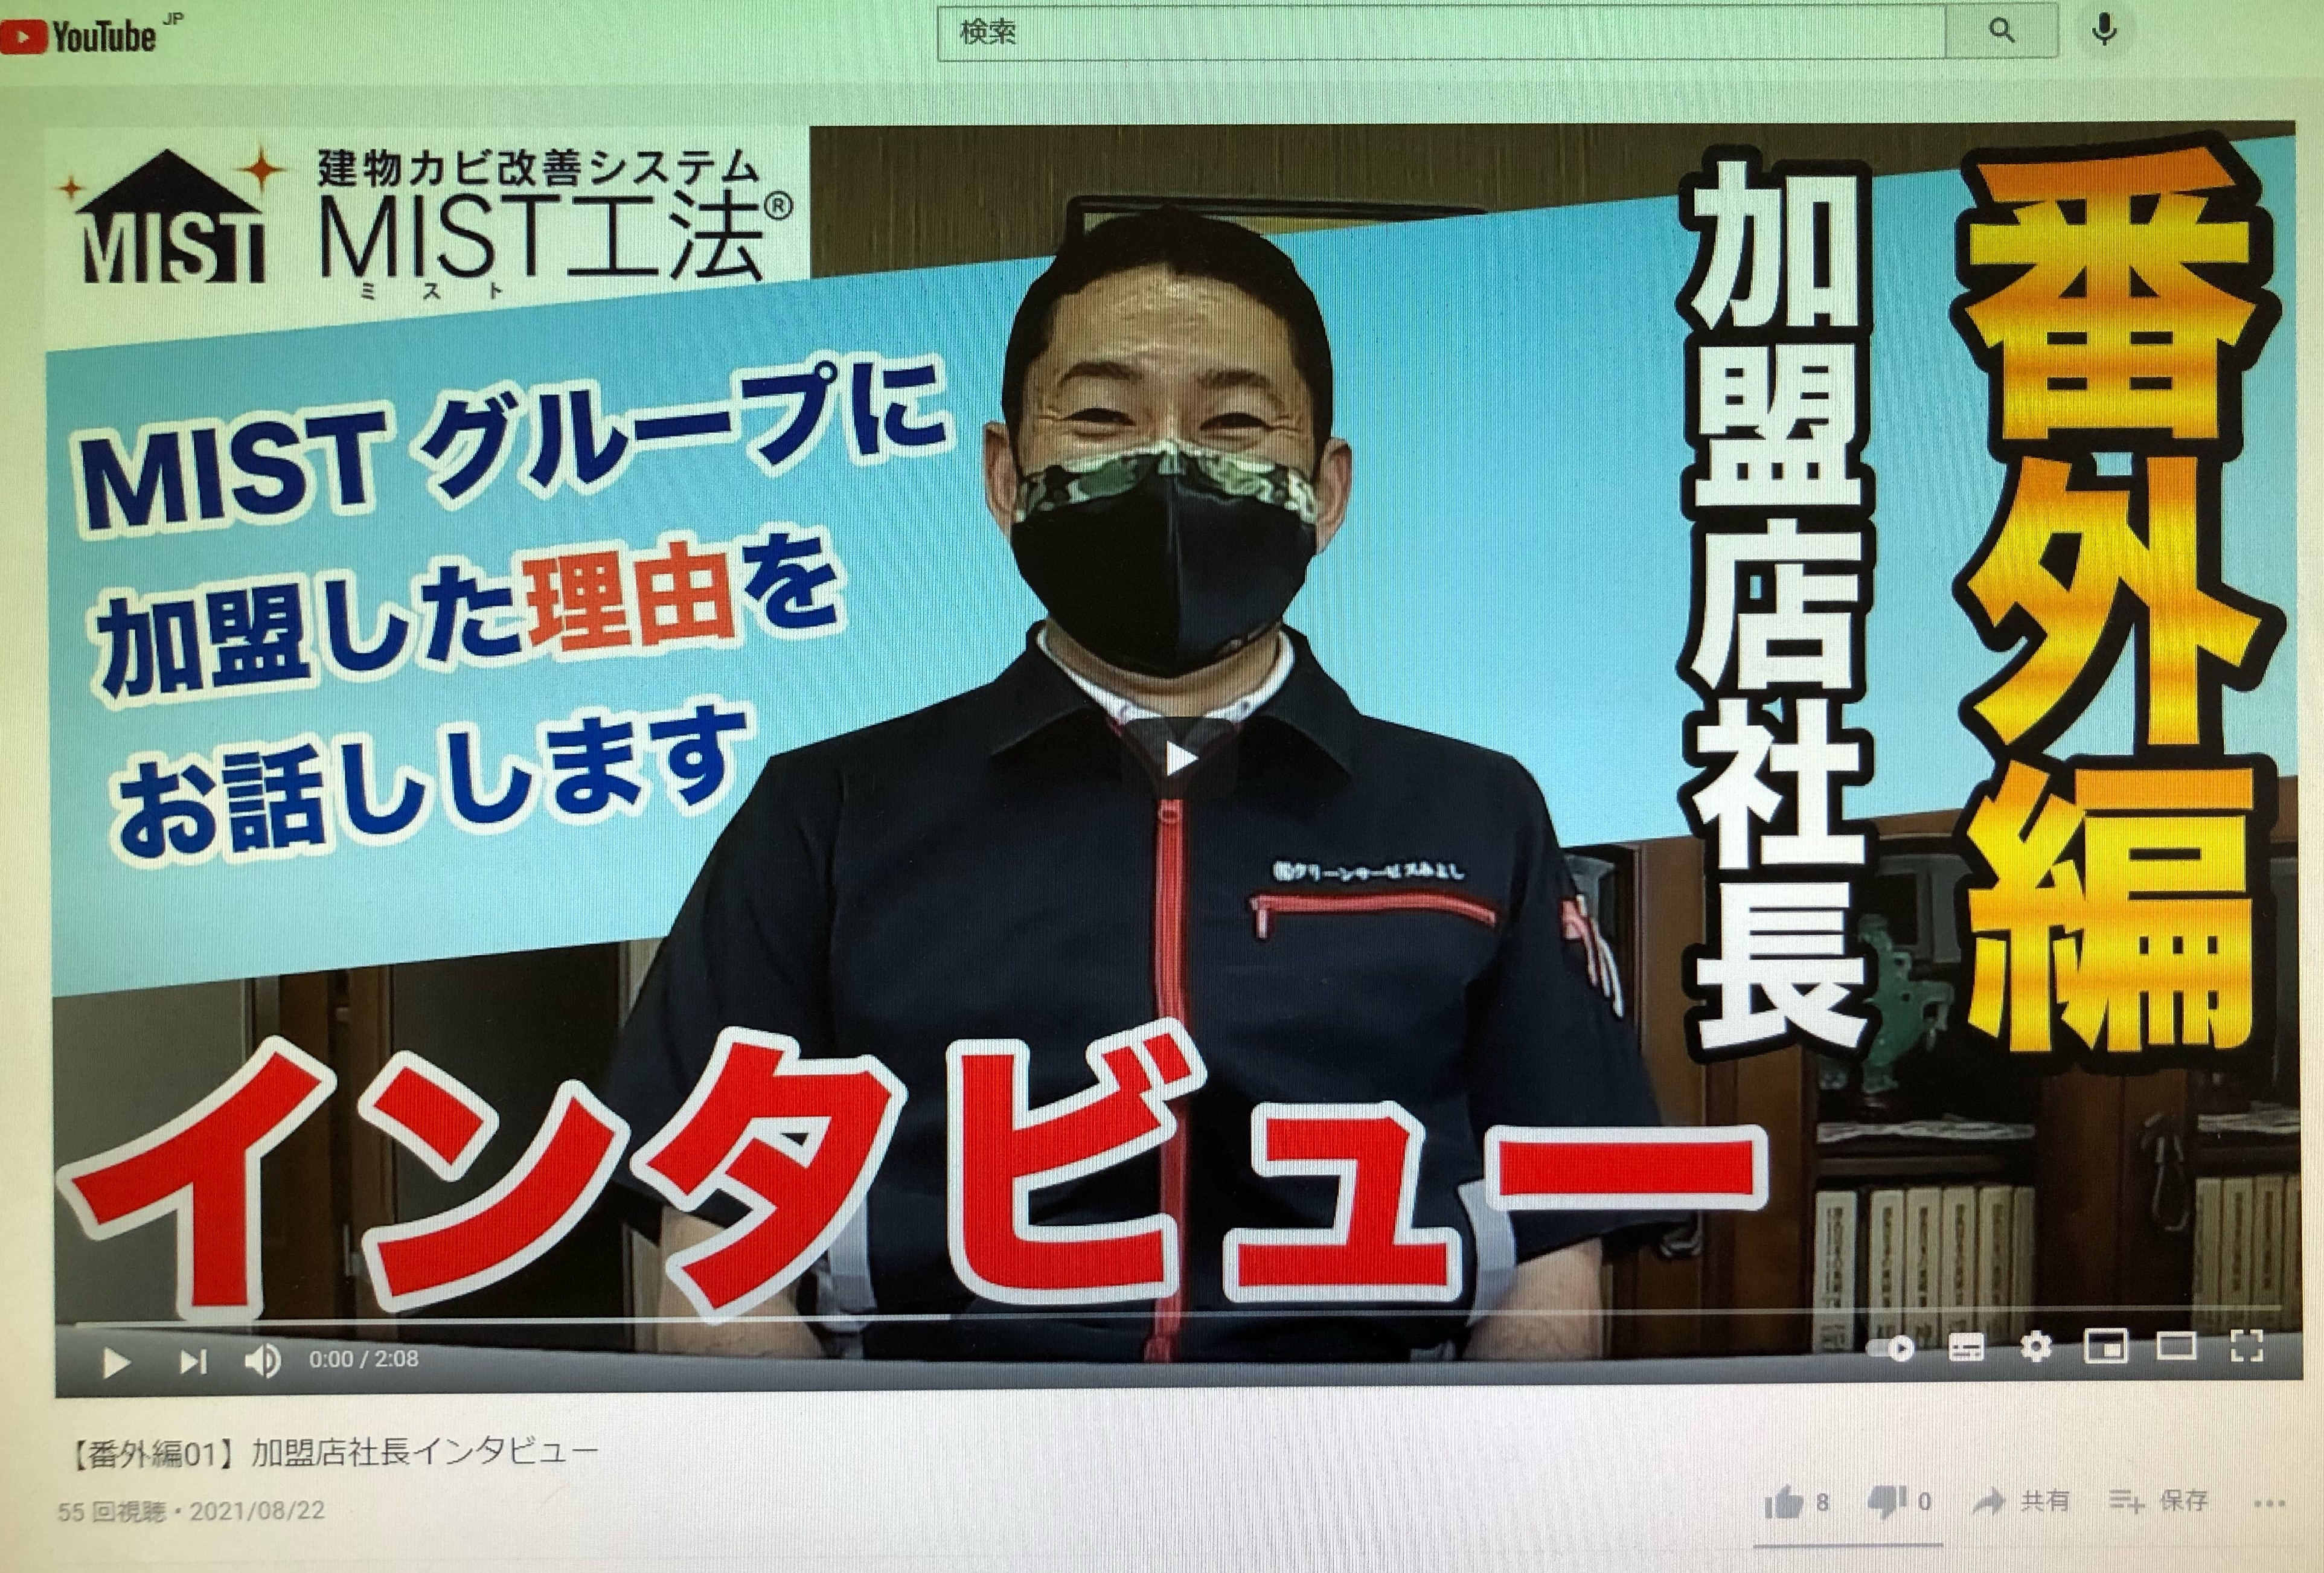 【YouTube】進め!カビバスターズ【番外編01】加盟店社長インタビュ…